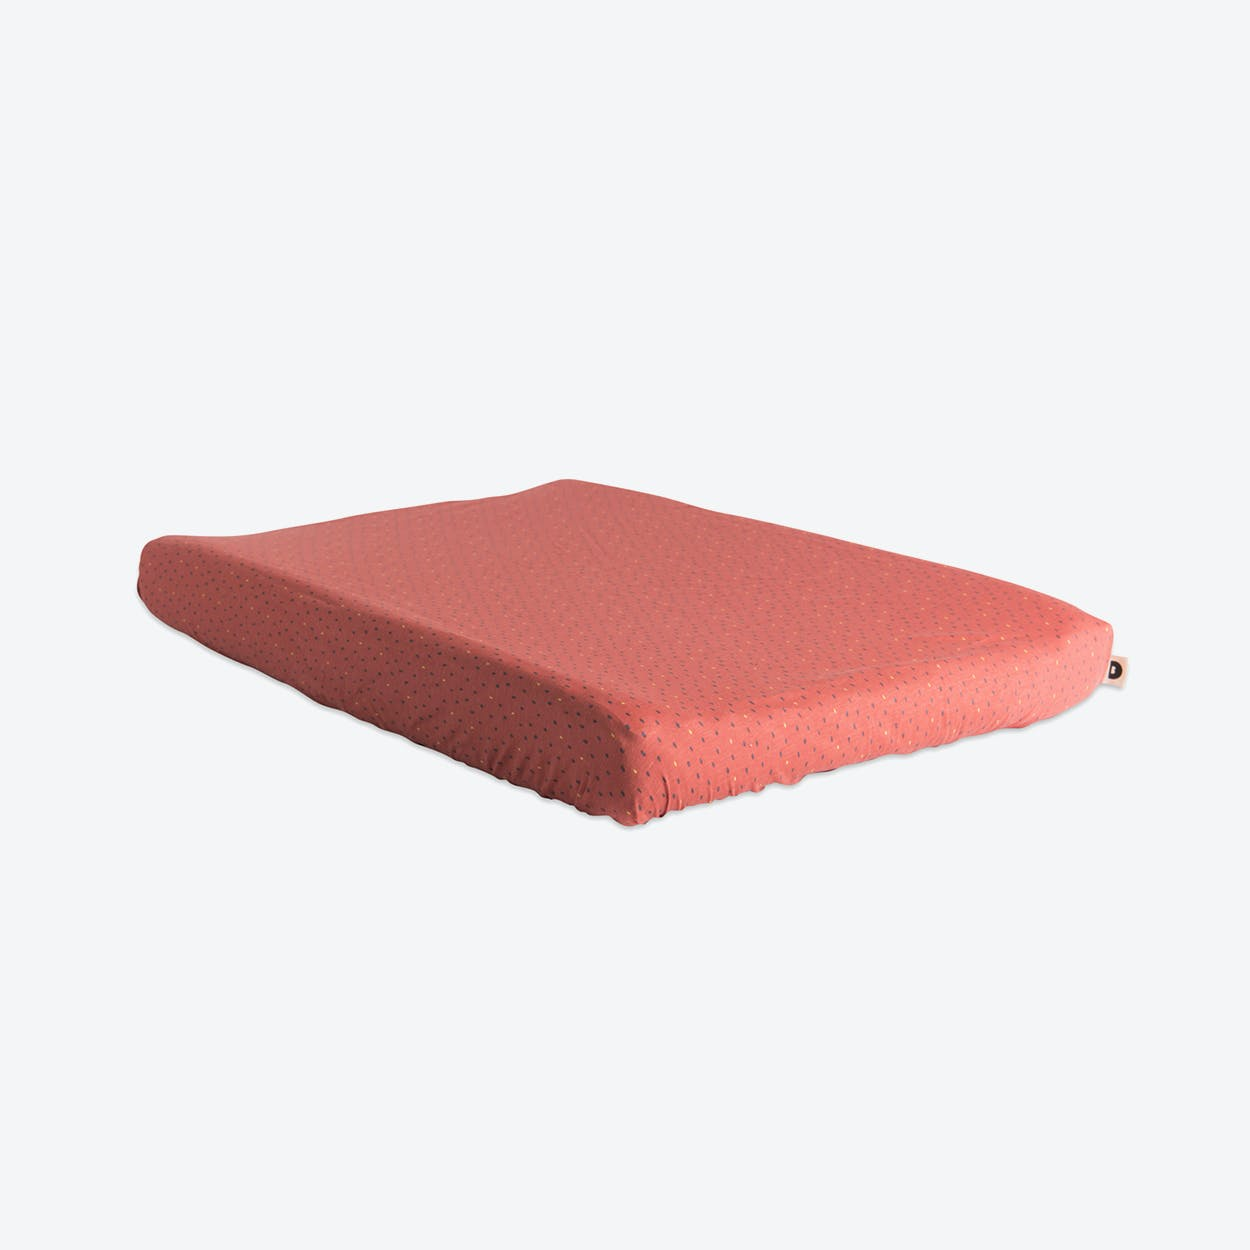 Coral Polka Dot Changing Mat Cover